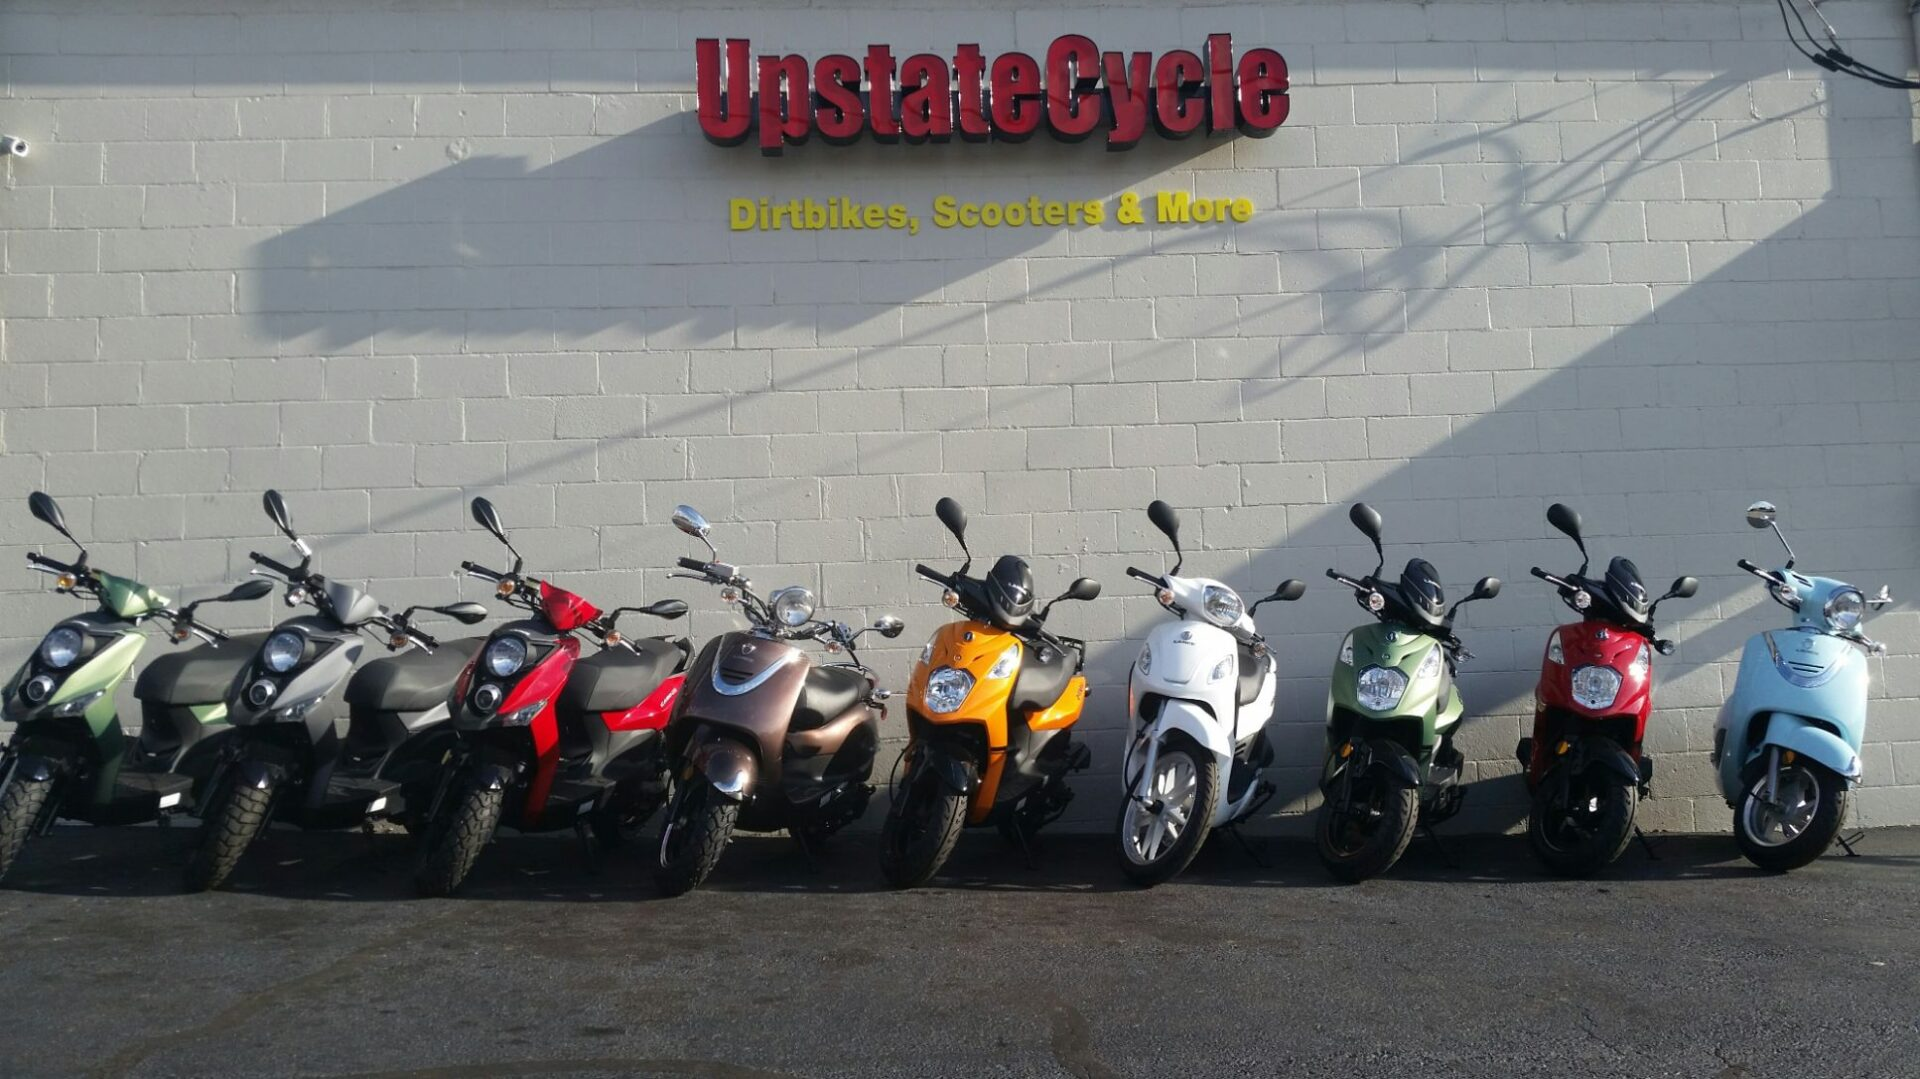 Upstate Cycle